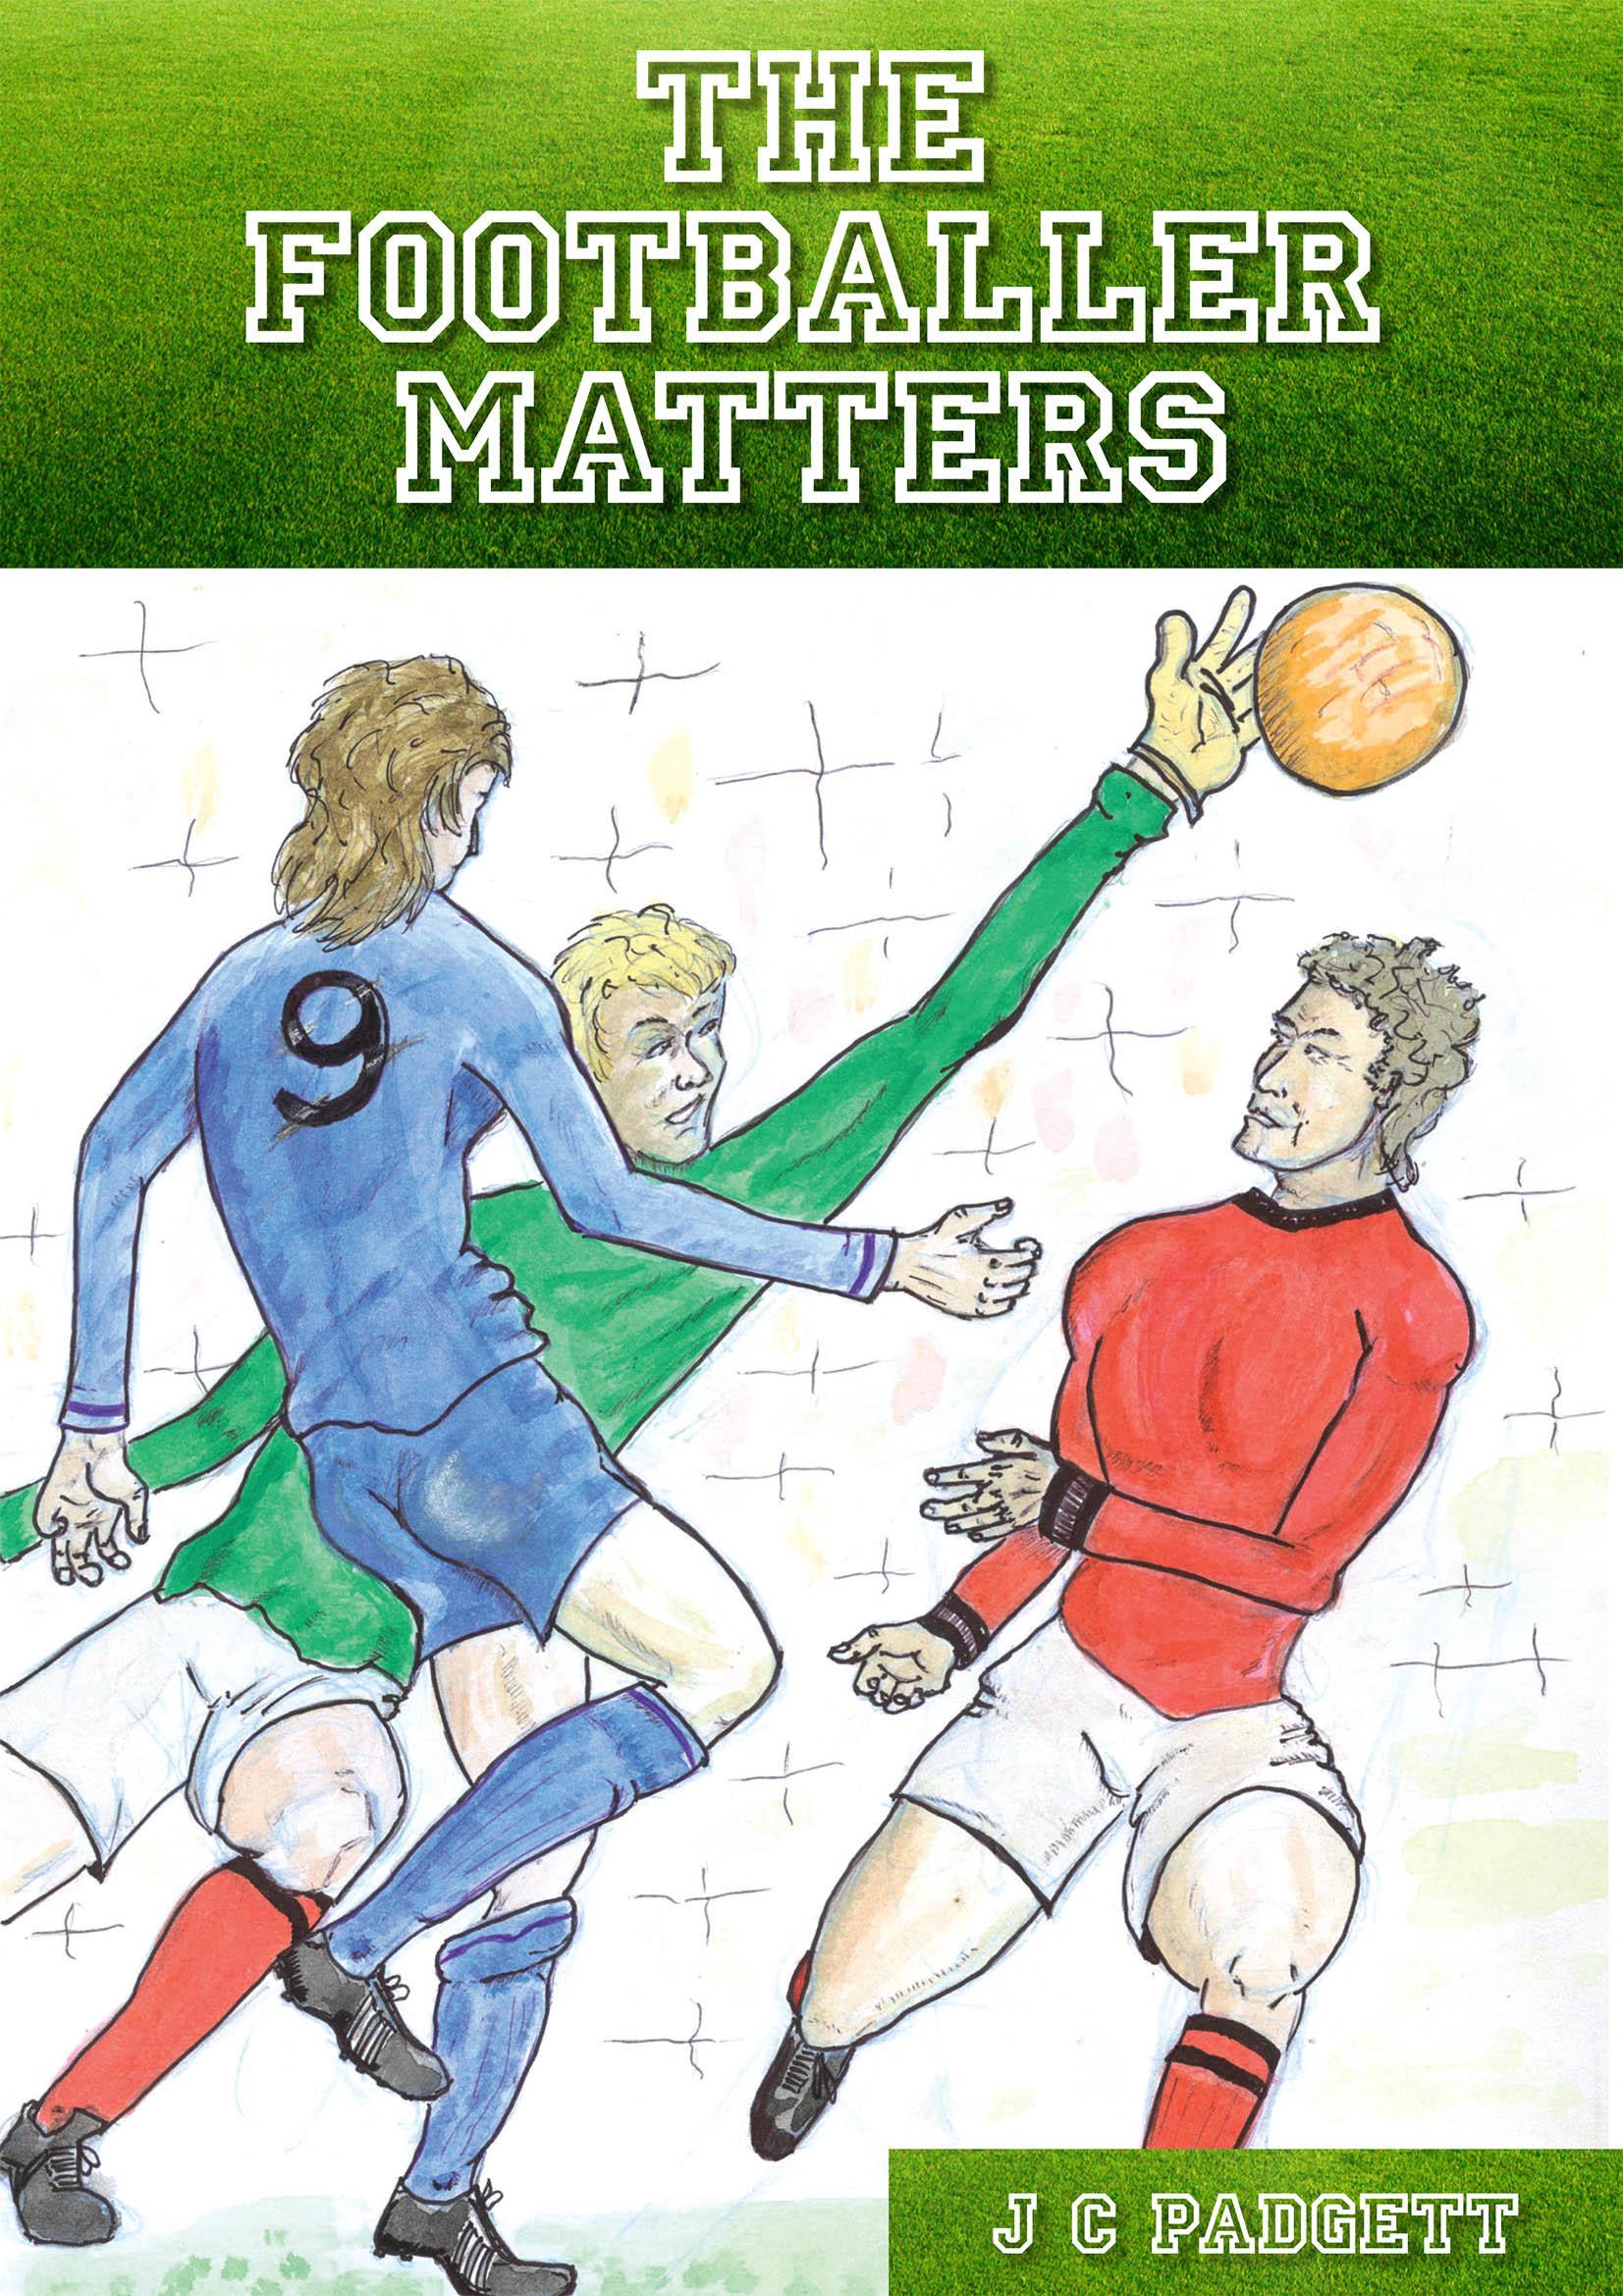 The Footballer Matters  by  J. C. Padgett